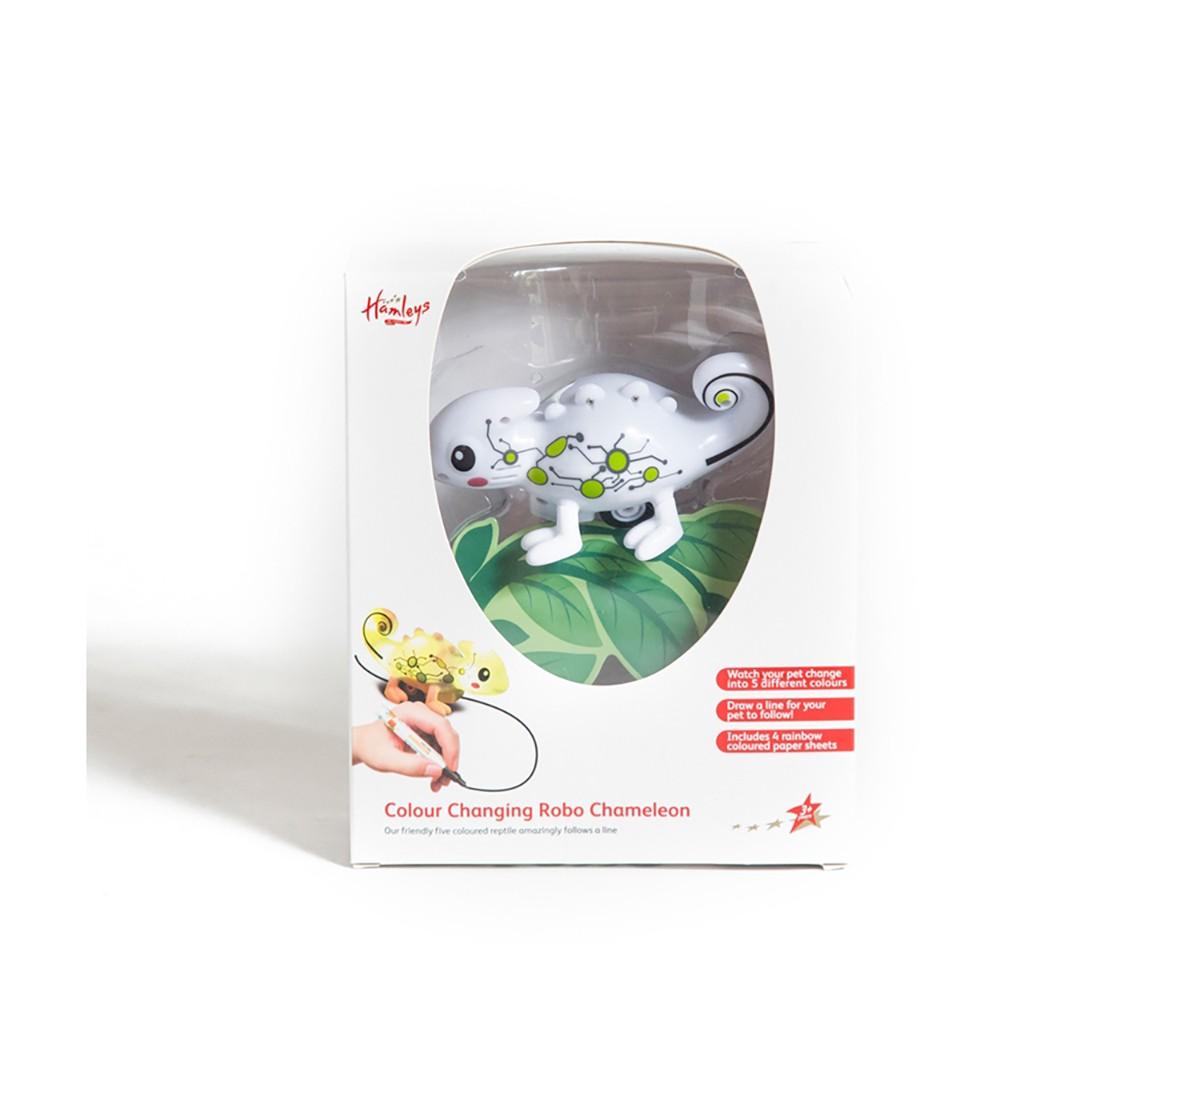 Hamleys Colour Change Chameleon Robotics for Kids age 3Y+ (White)